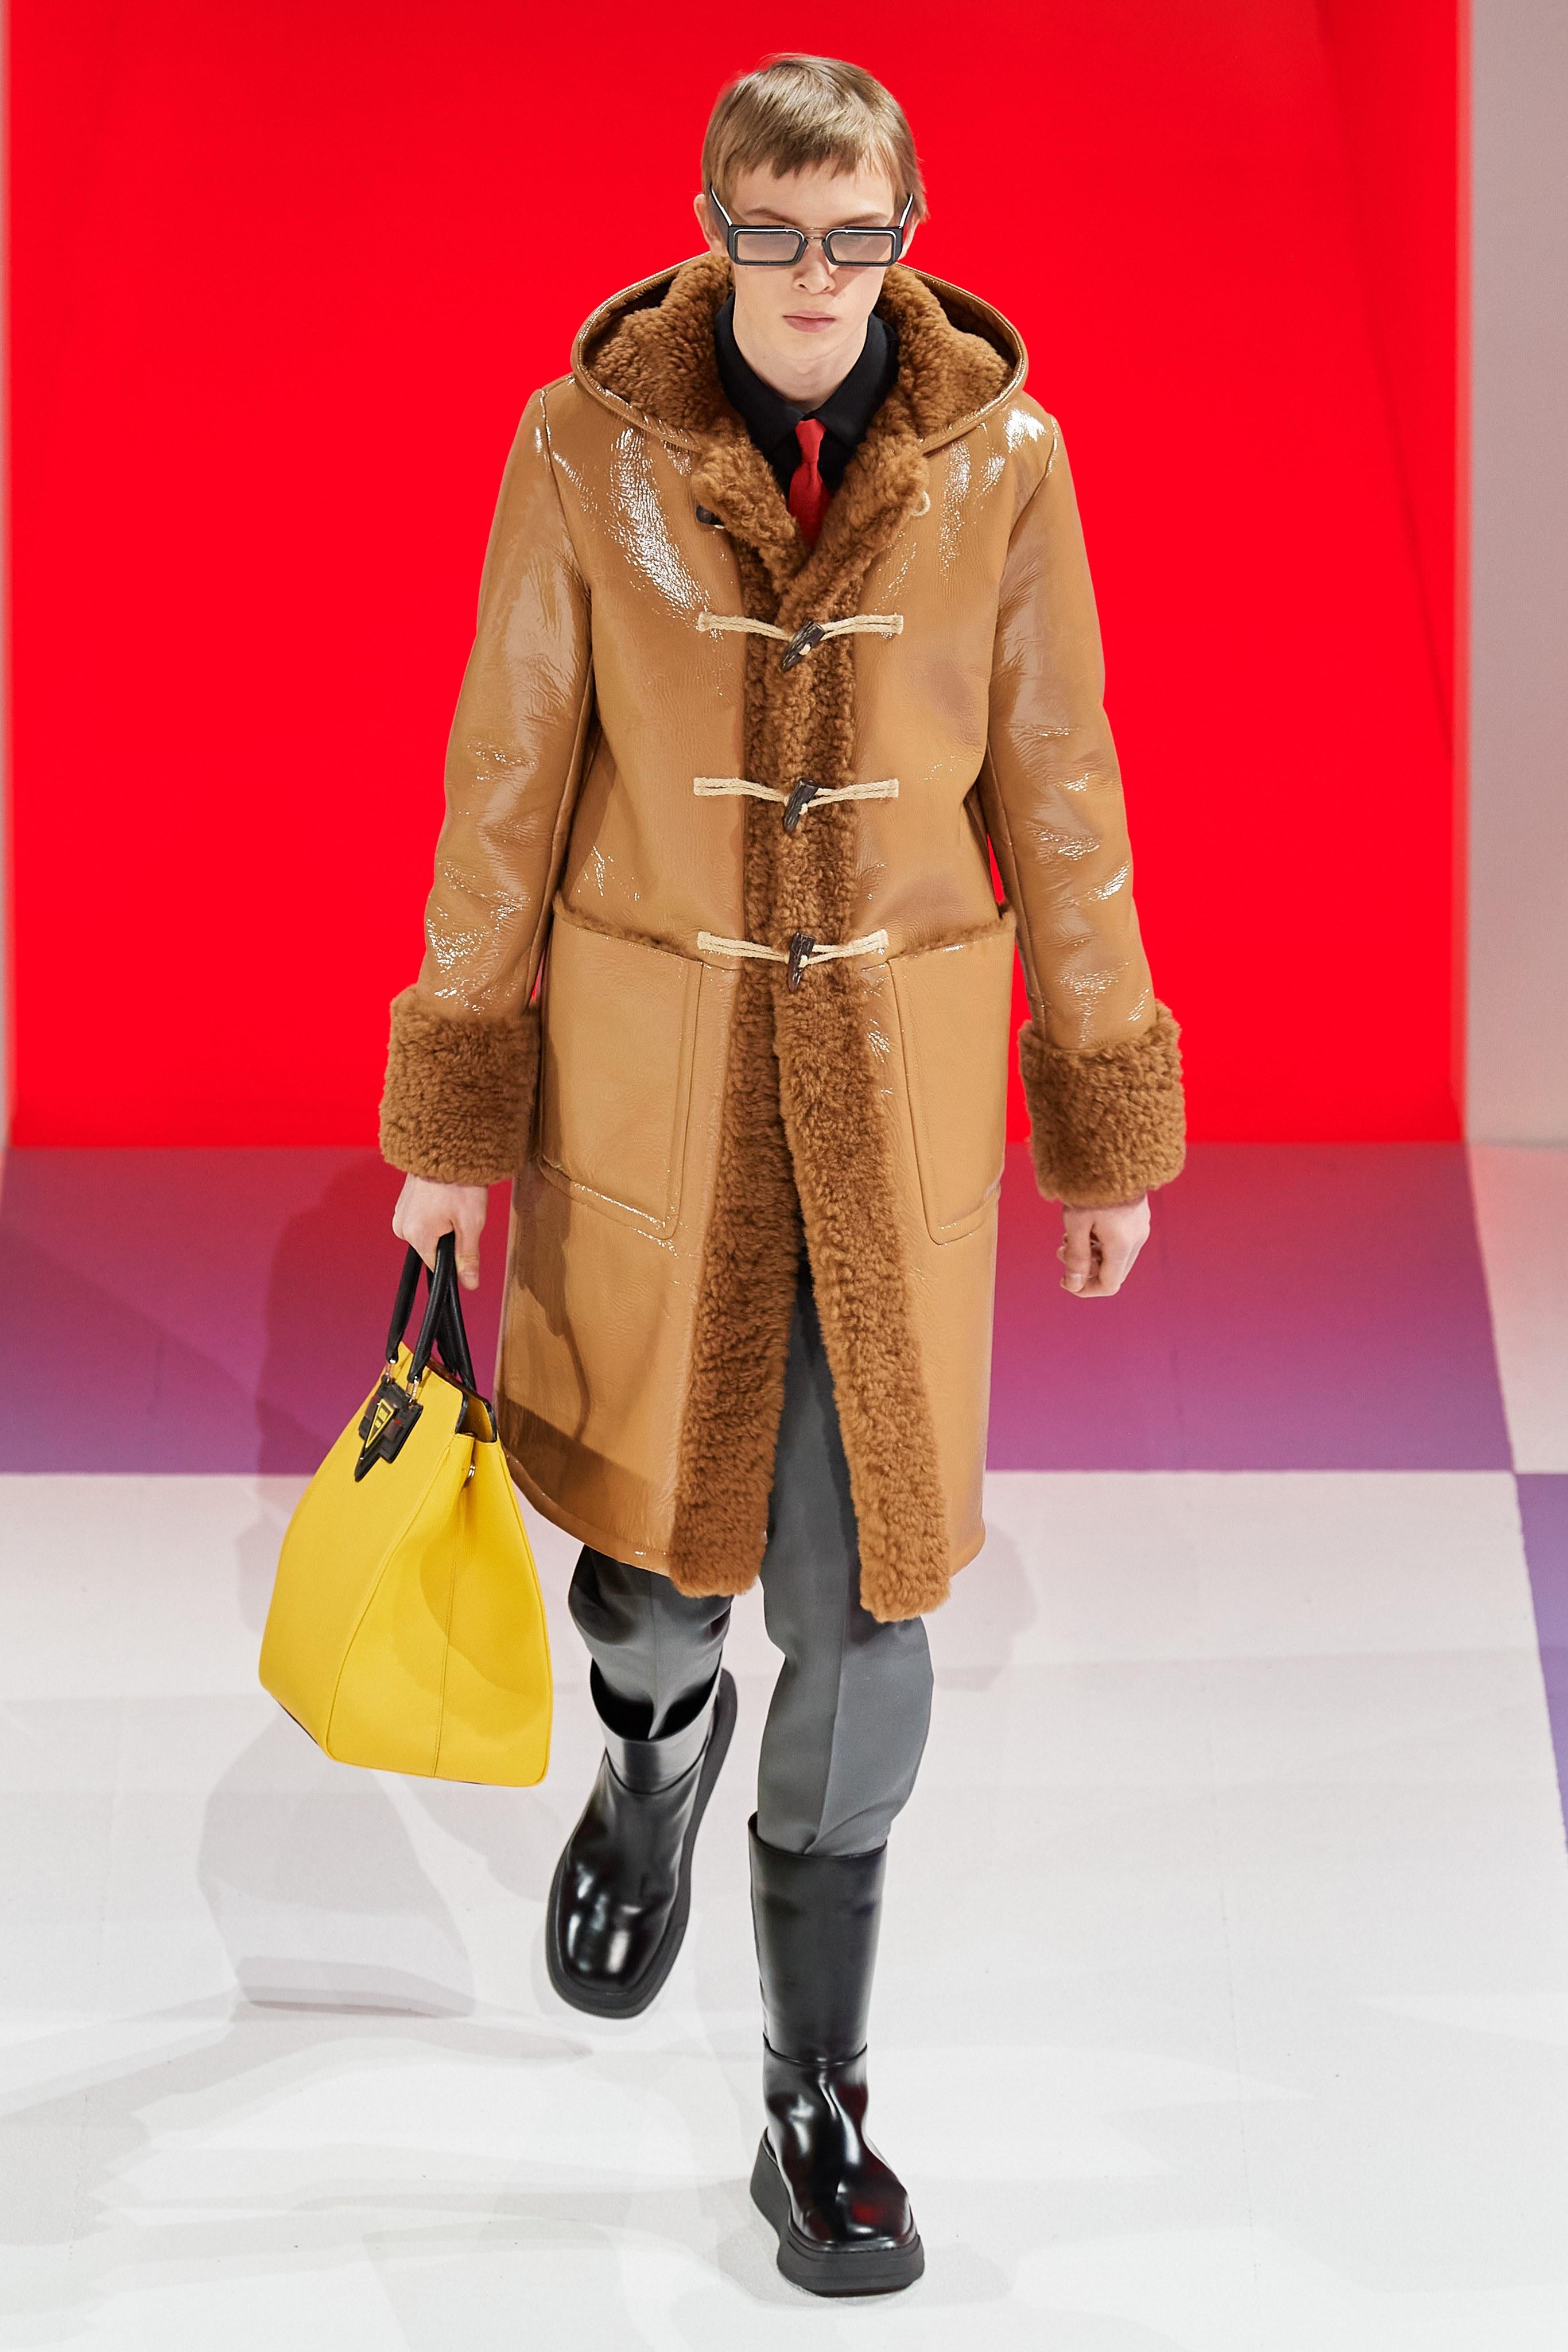 MFW: Prada Autumn/Winter 2020 Collection